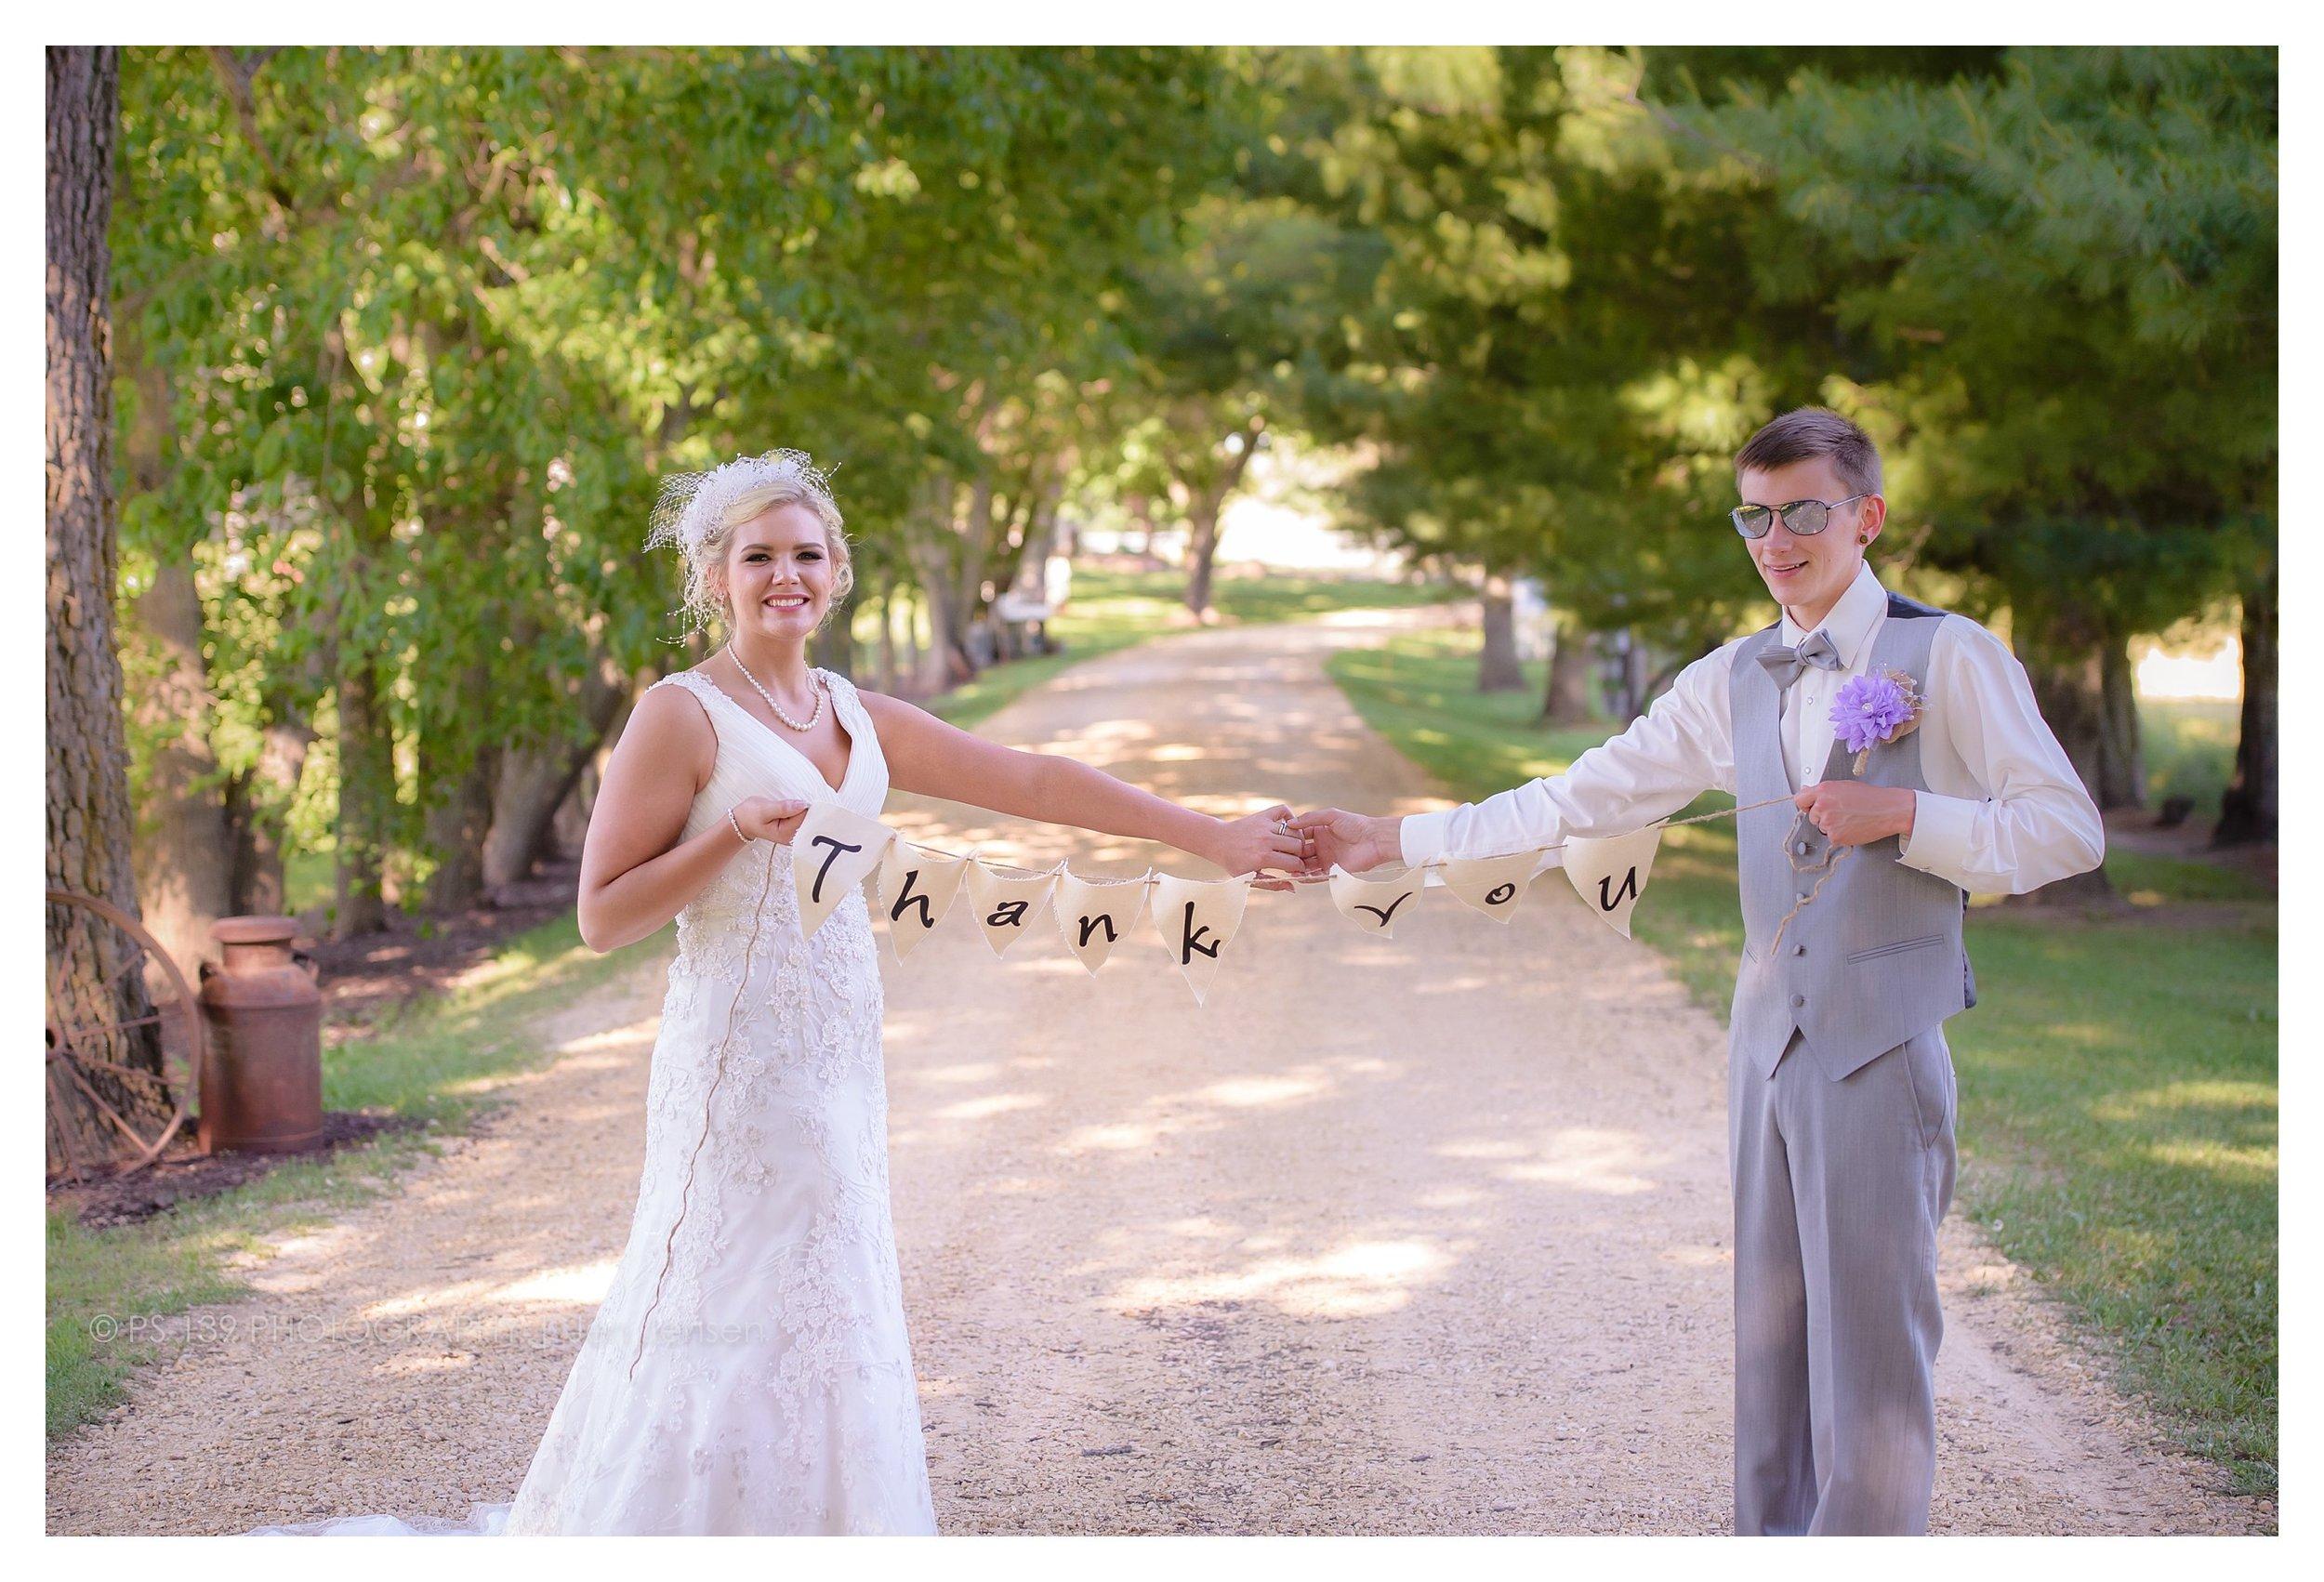 oregon Illinois oak lane farm wisconsin wedding photographer bayfield wi ps 139 photography jen jensen_0233.jpg